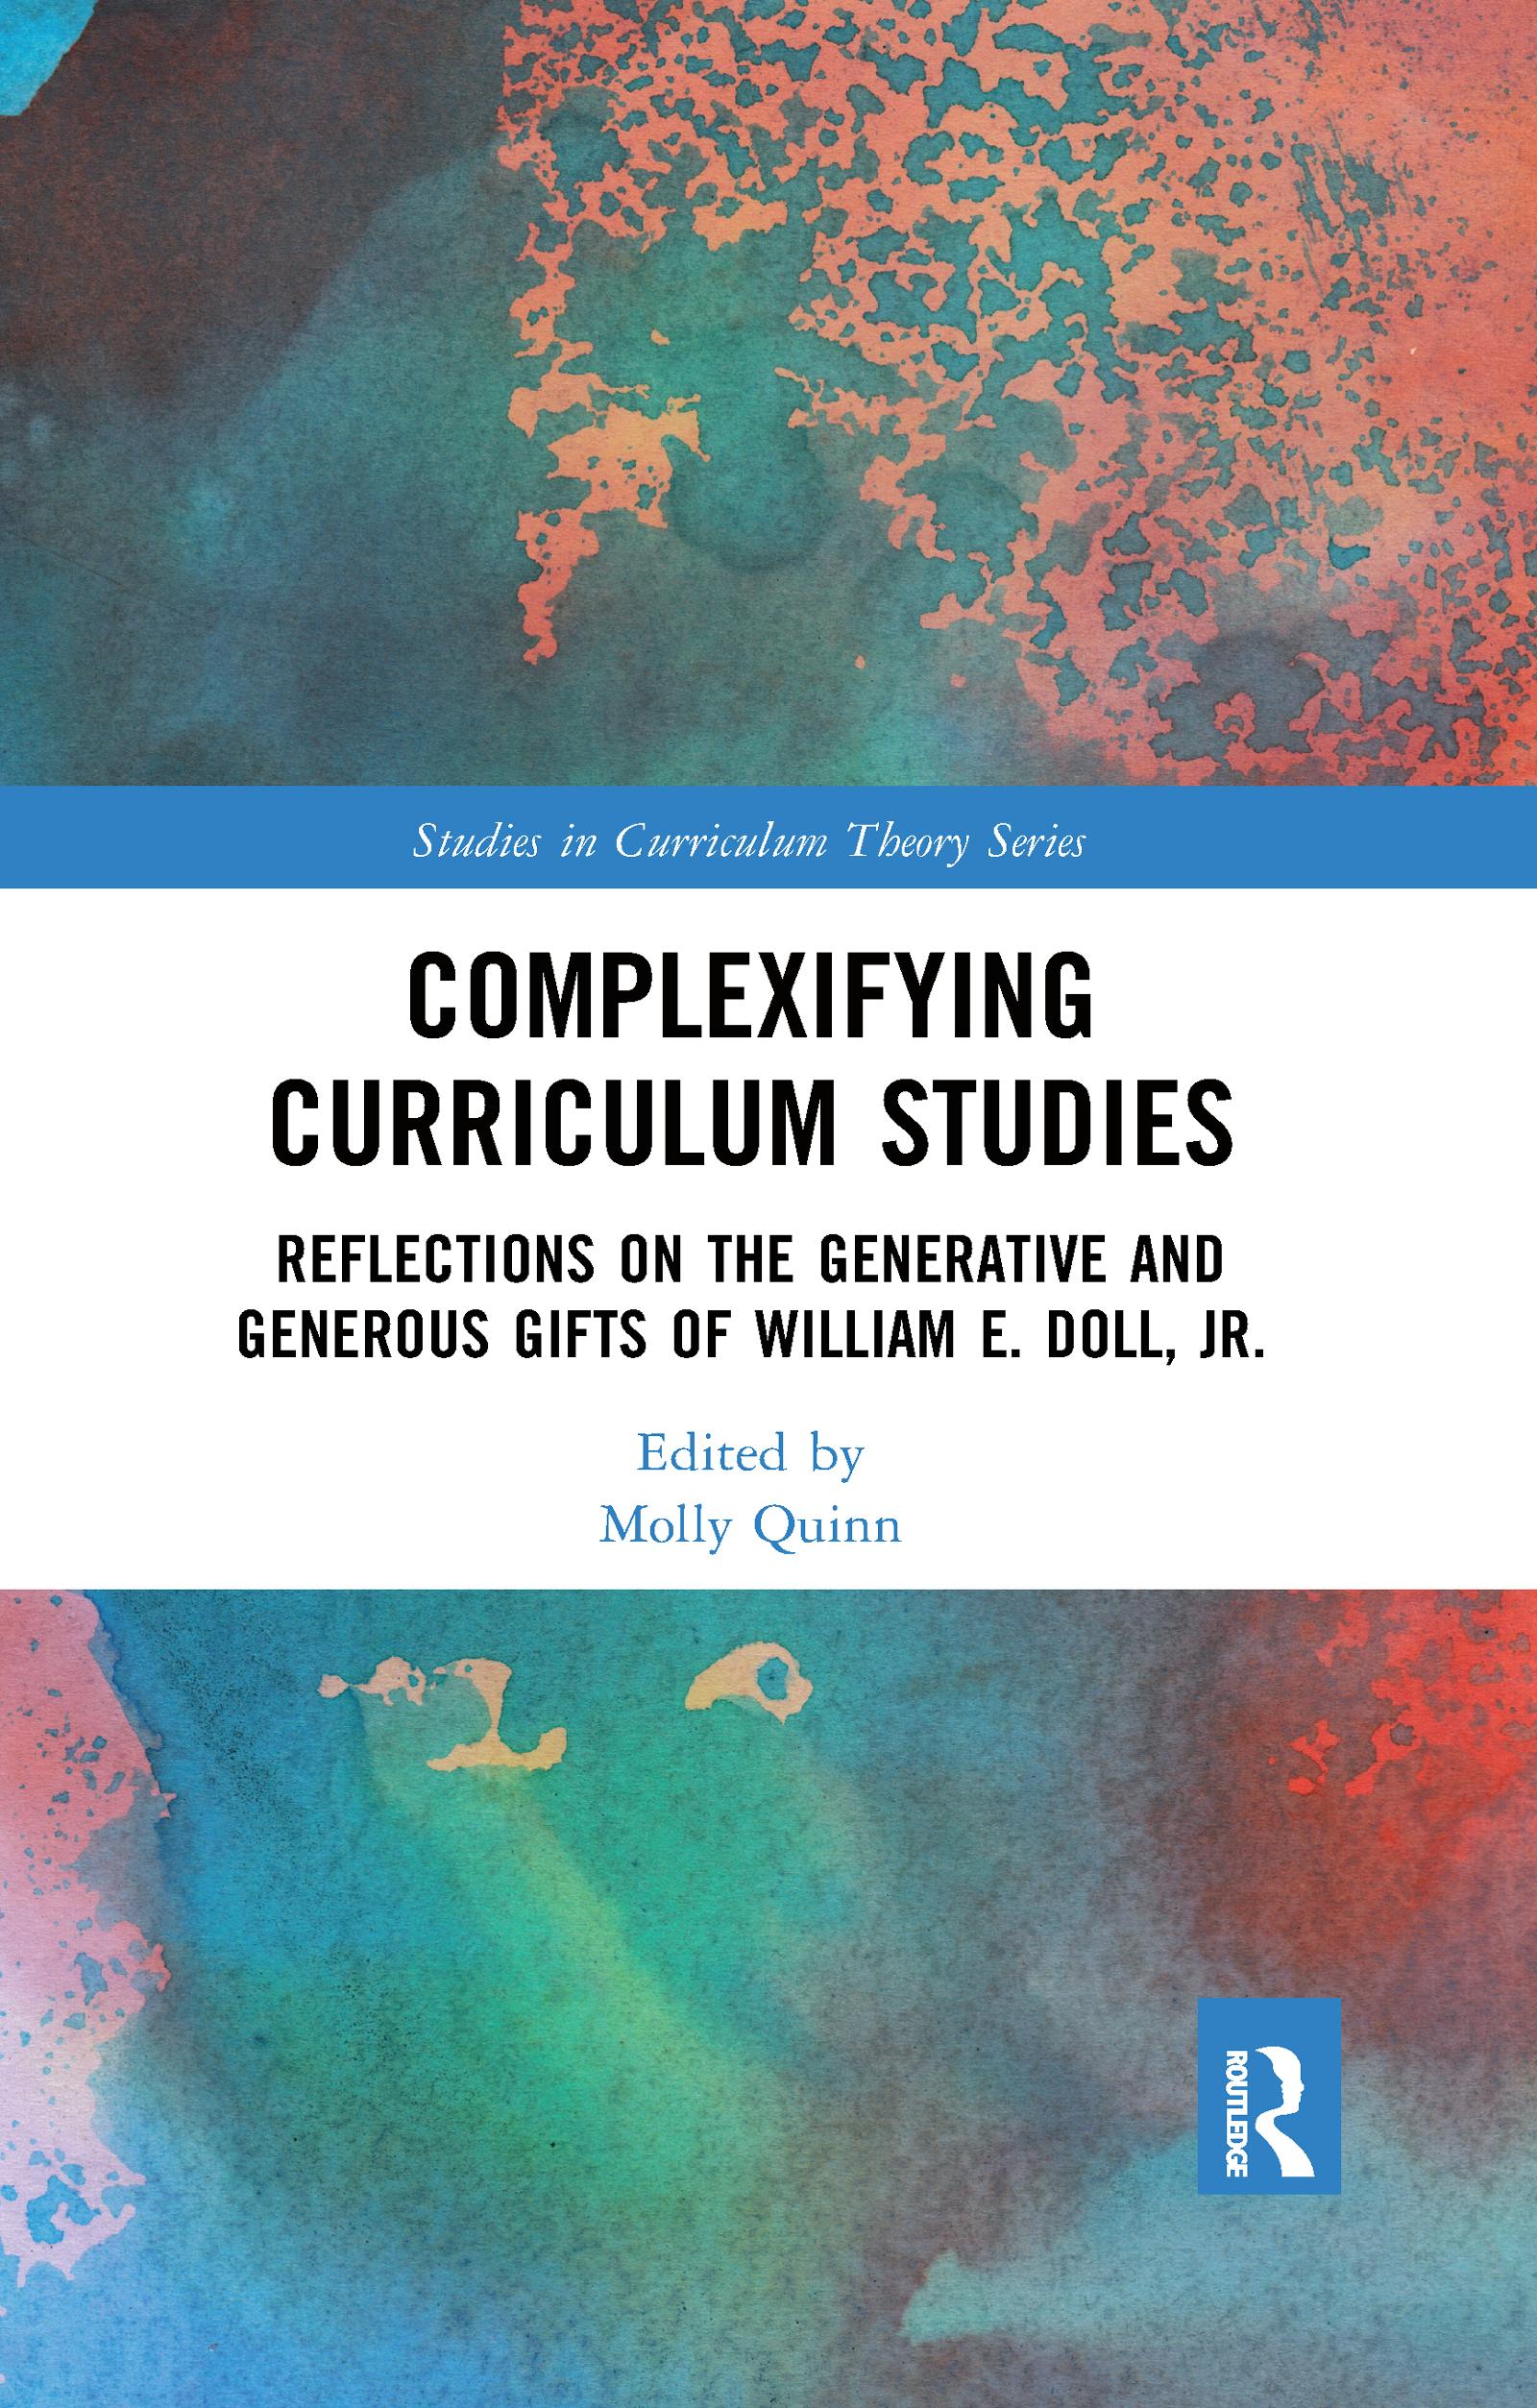 Complexifying Curriculum Studies